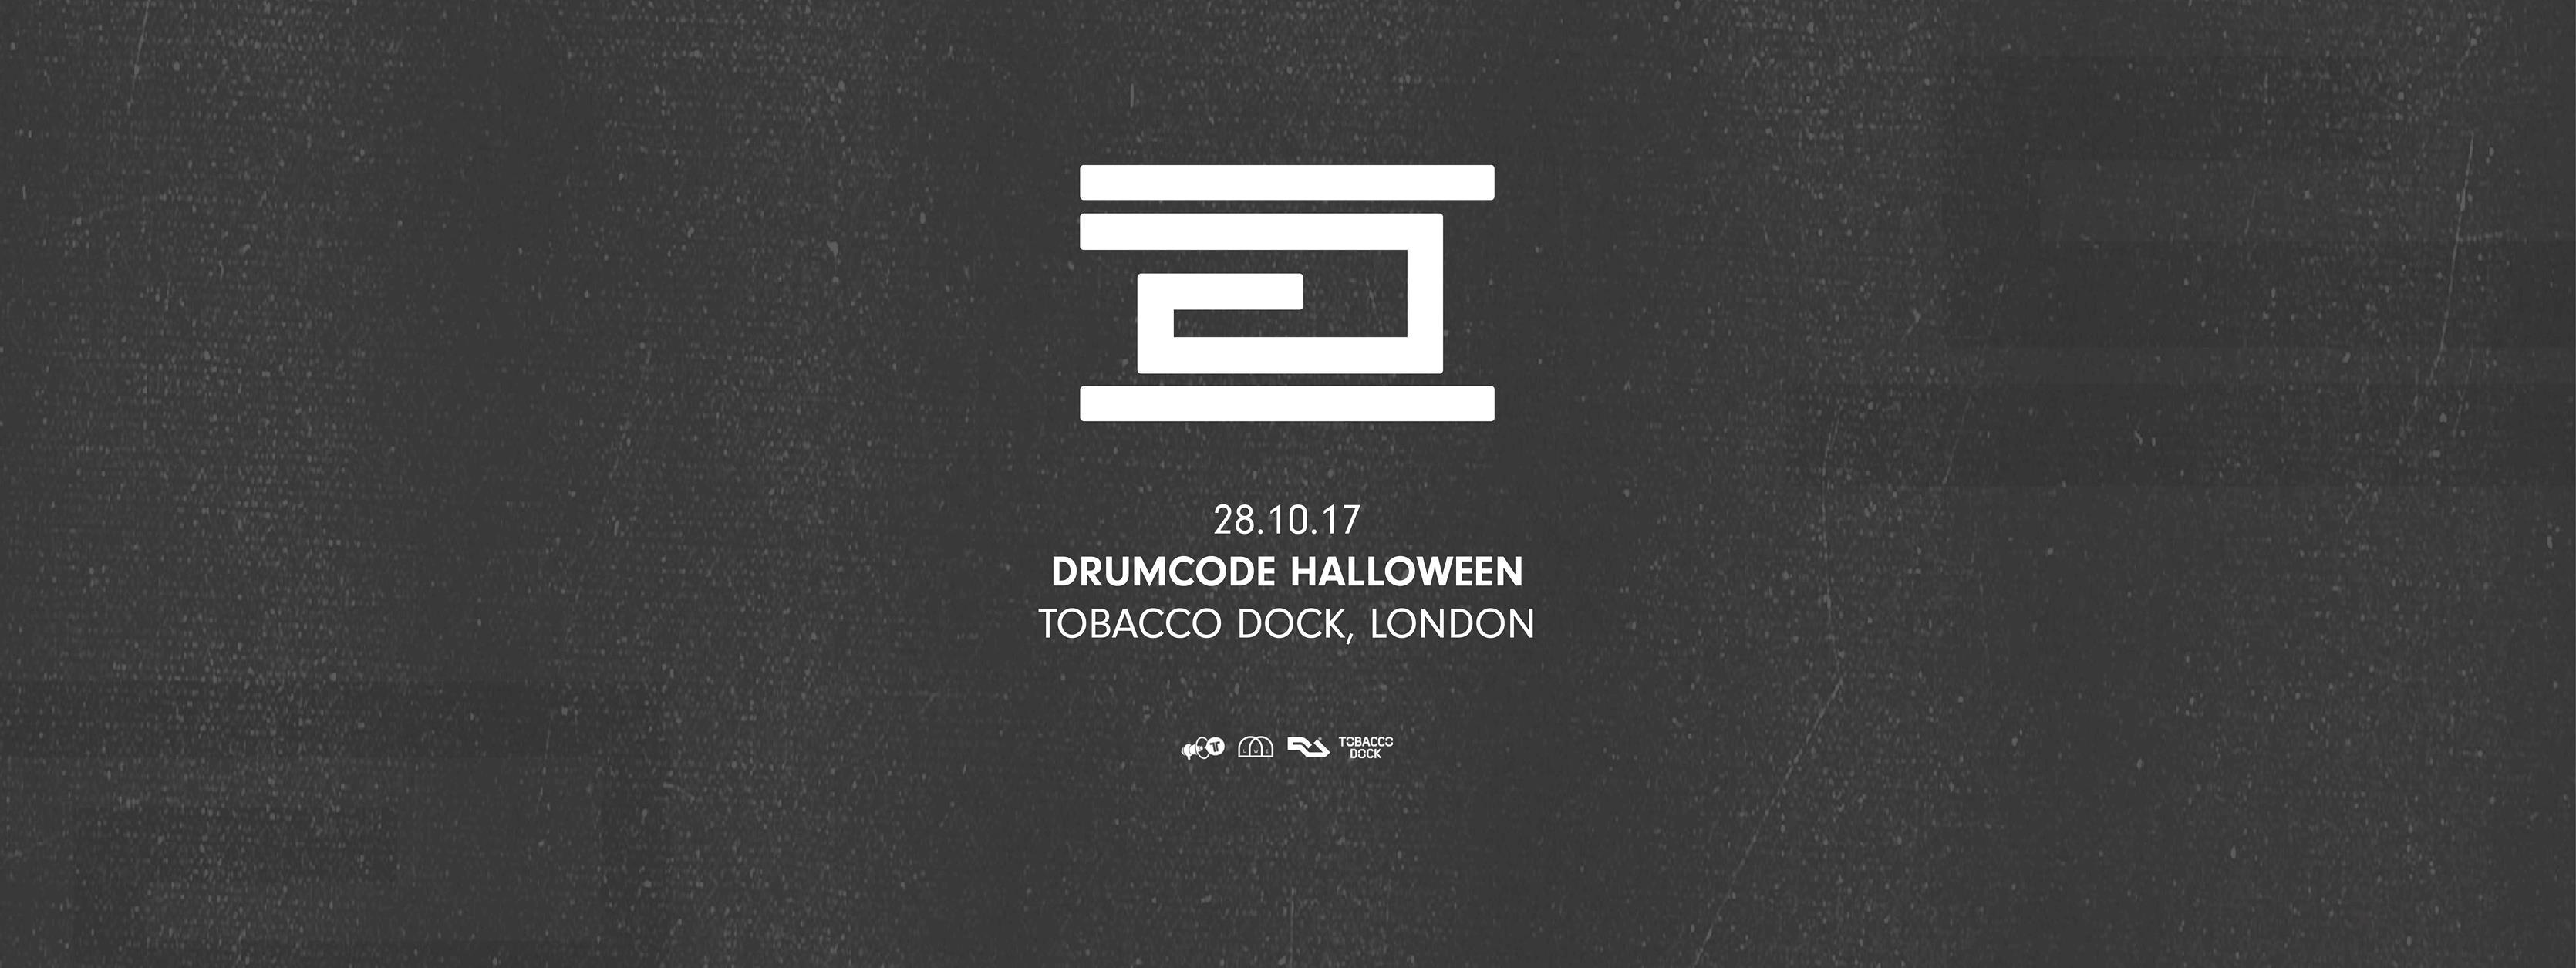 Drumcode Halloween 2017 Tickets | Tobacco Dock LONDON | Sat 28th ...